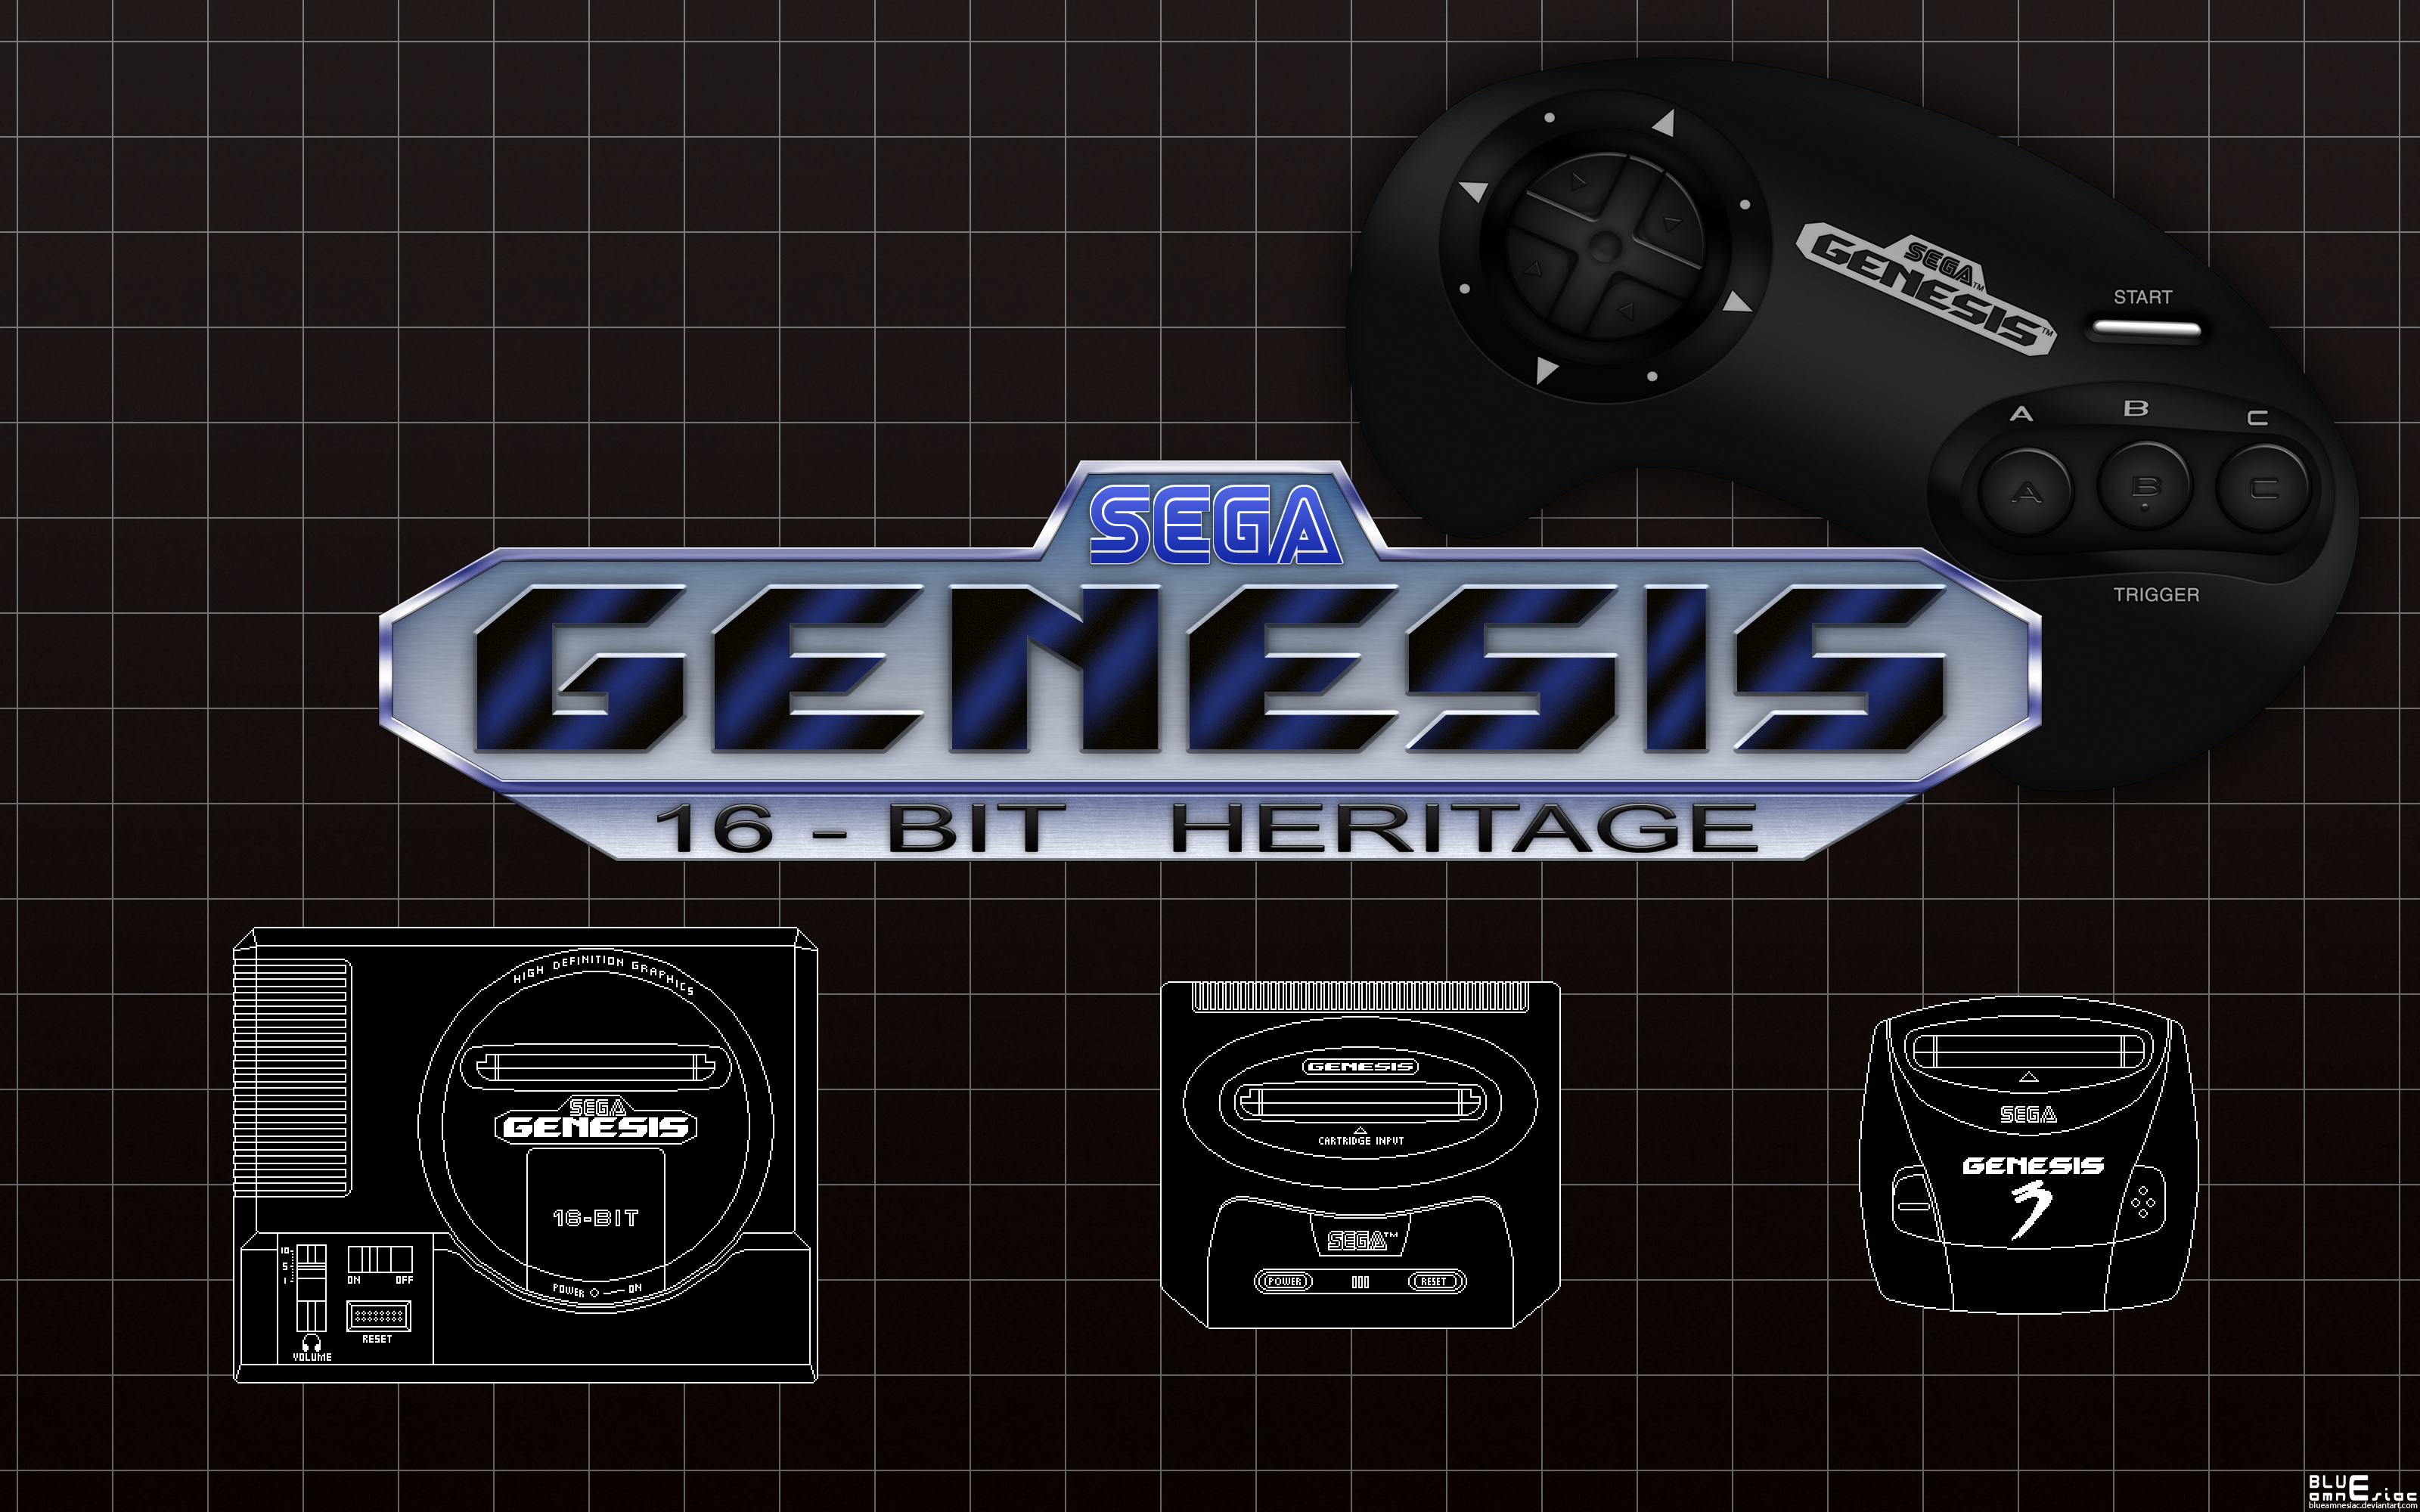 Sega Genesis 16 bit Heritage Wallpaper by BLUEamnesiac 3200x2000